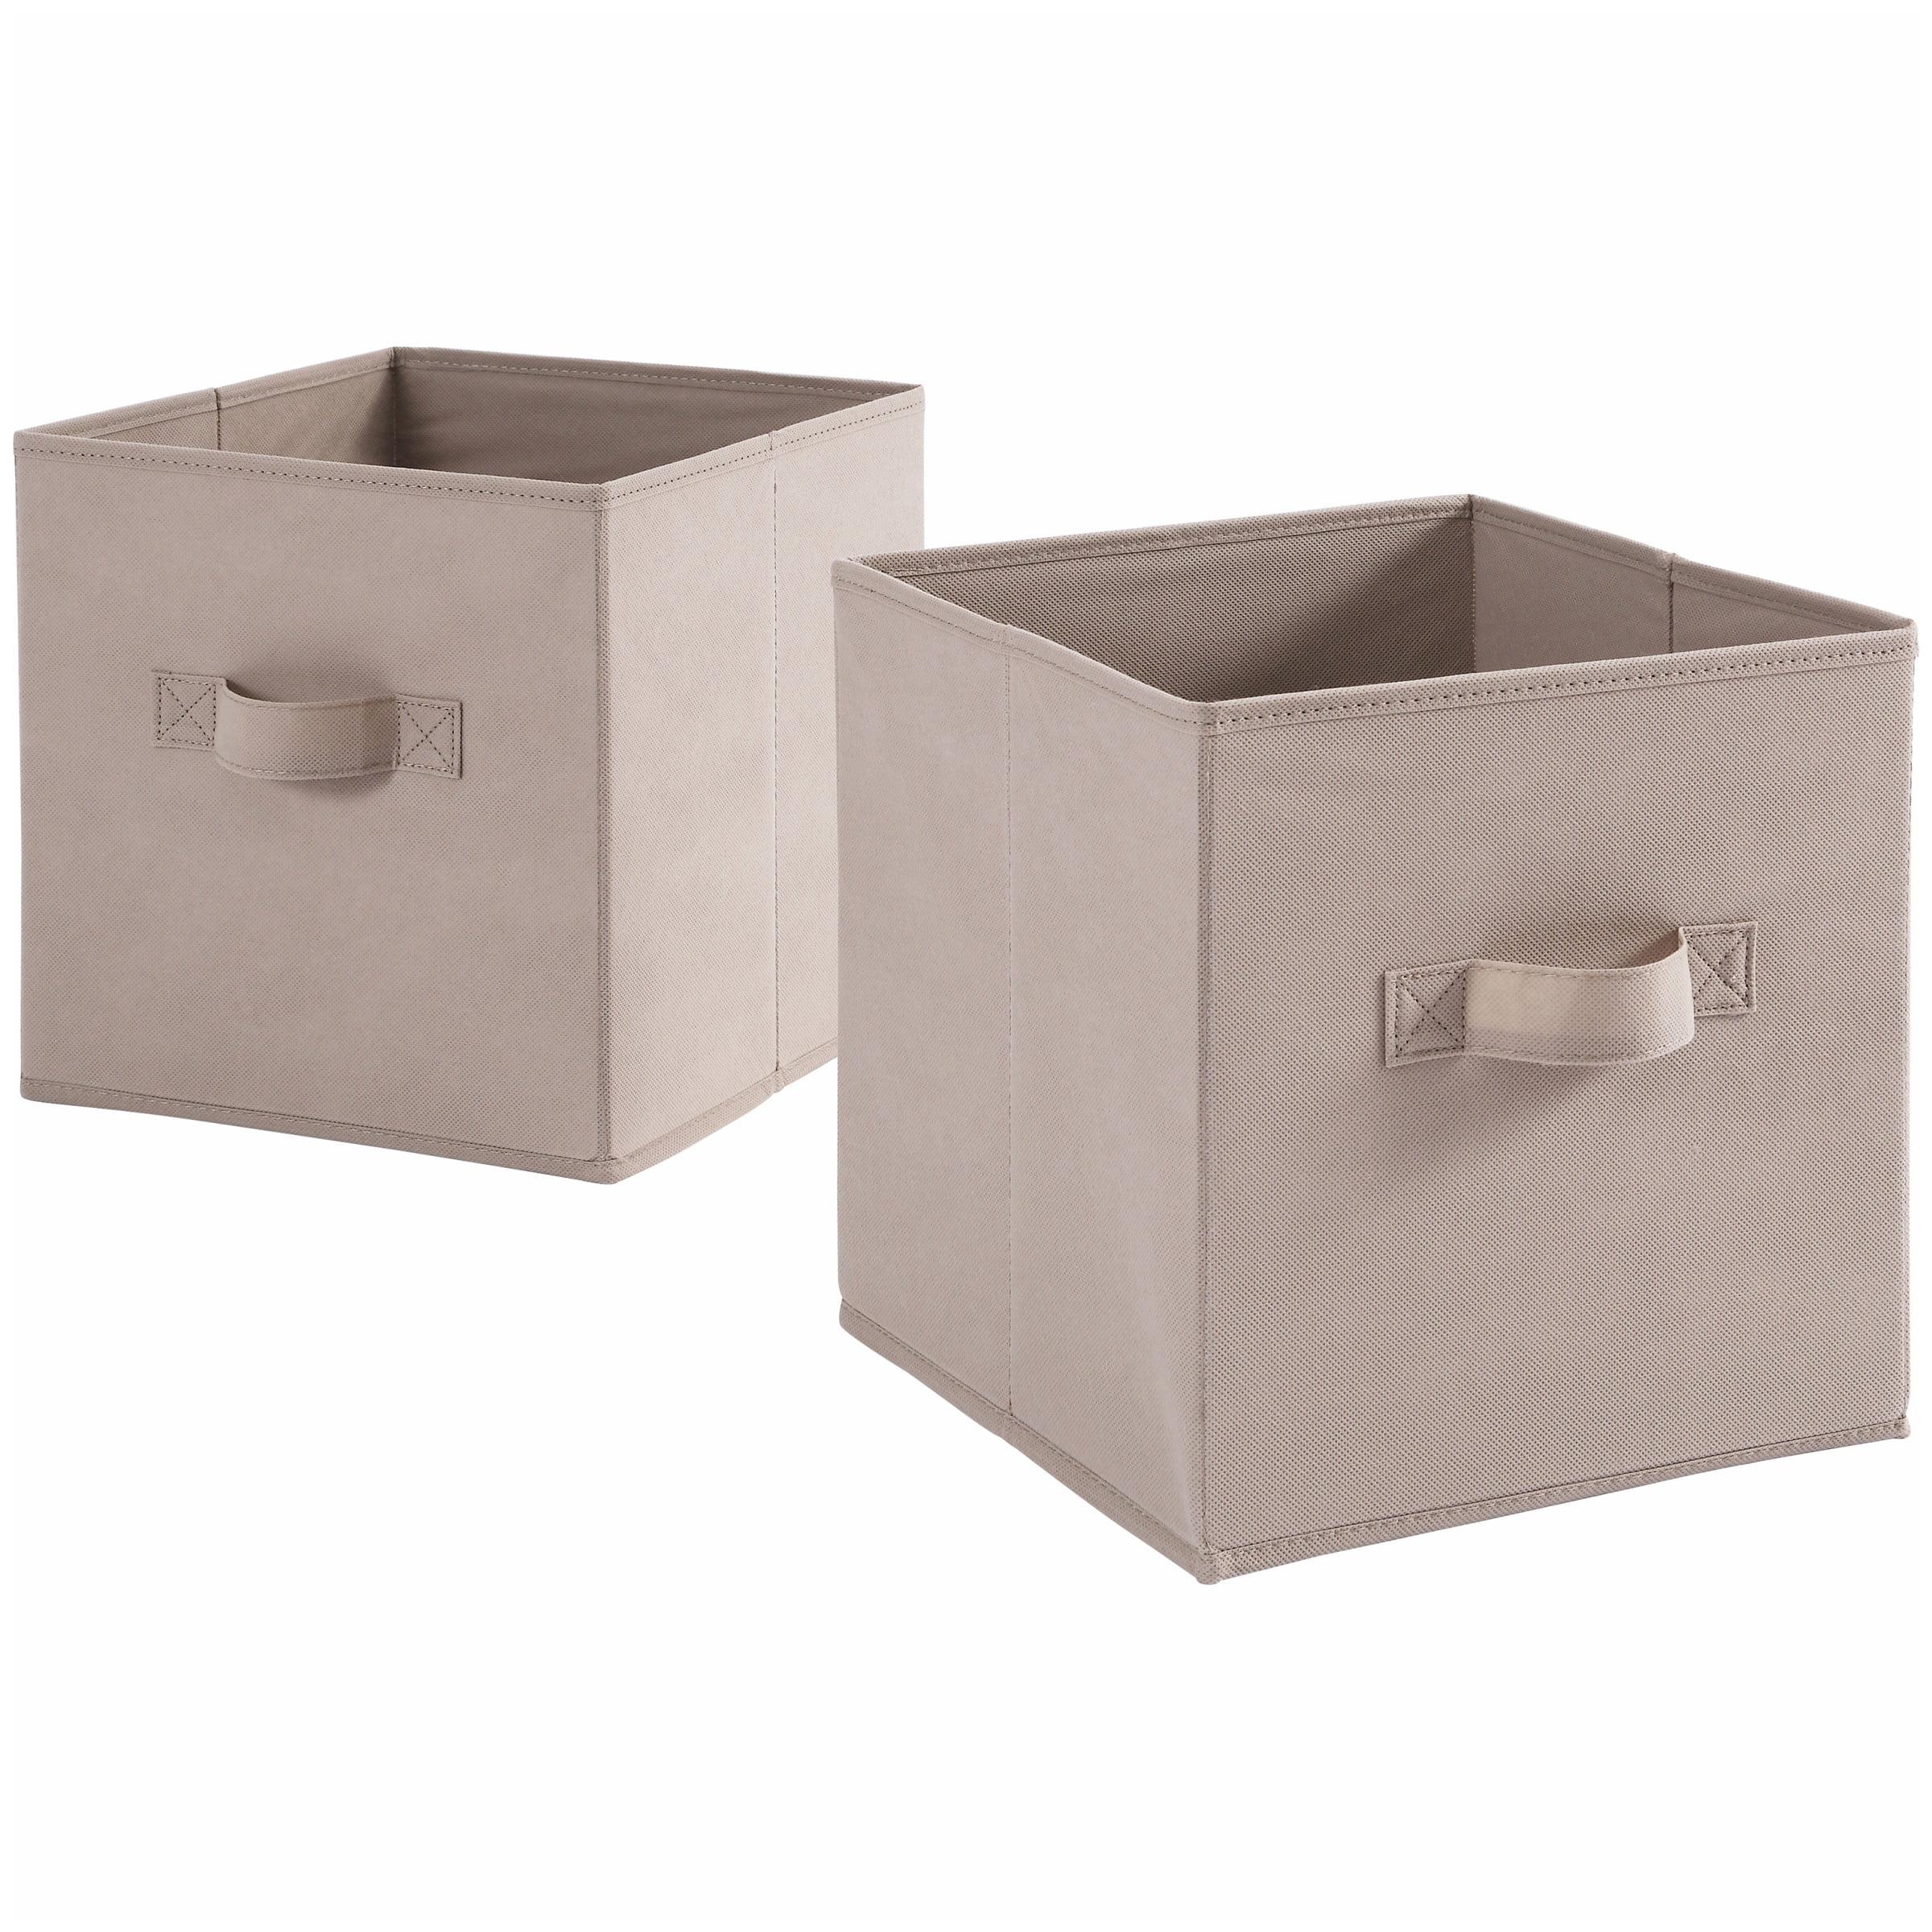 Mainstays Collapsible Fabric Storage Cube Set Of 2 Multiple Colors 10 5 X 10 5 Walmart Com Walmart Com